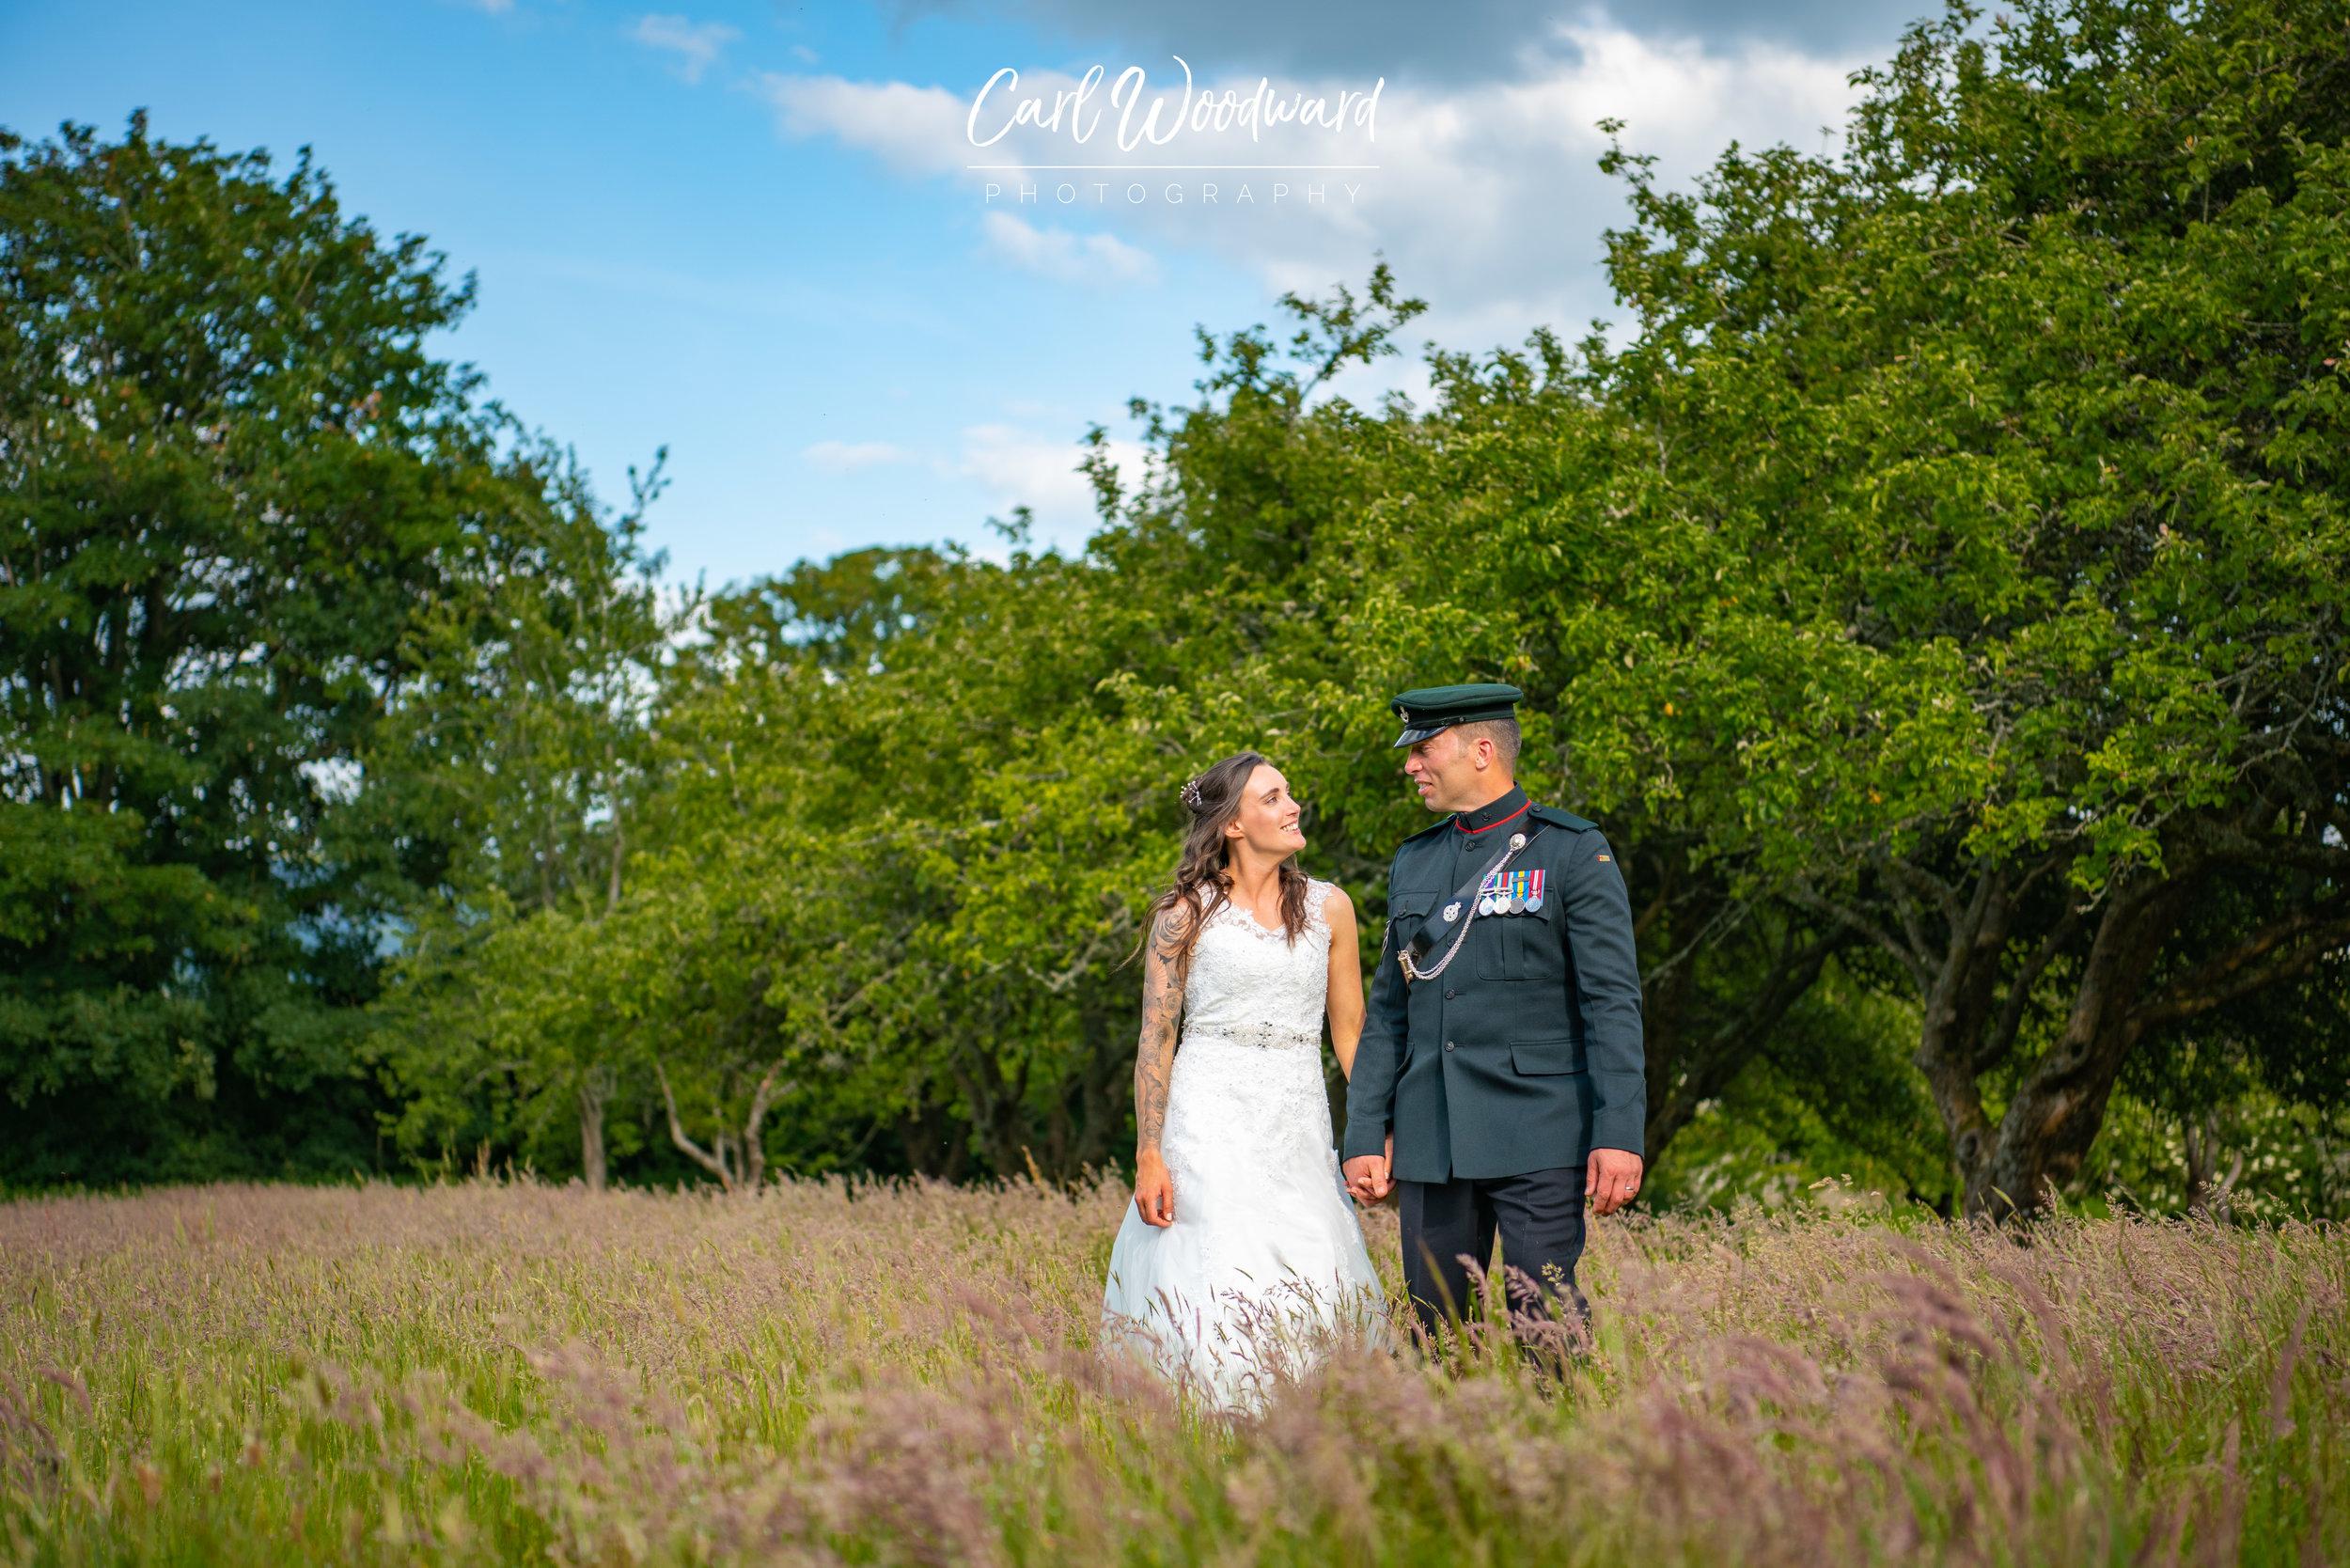 012-The-Old-Rectory-Hotel-Wedding-Photography-Cardiff-Wedding-Photography.jpg